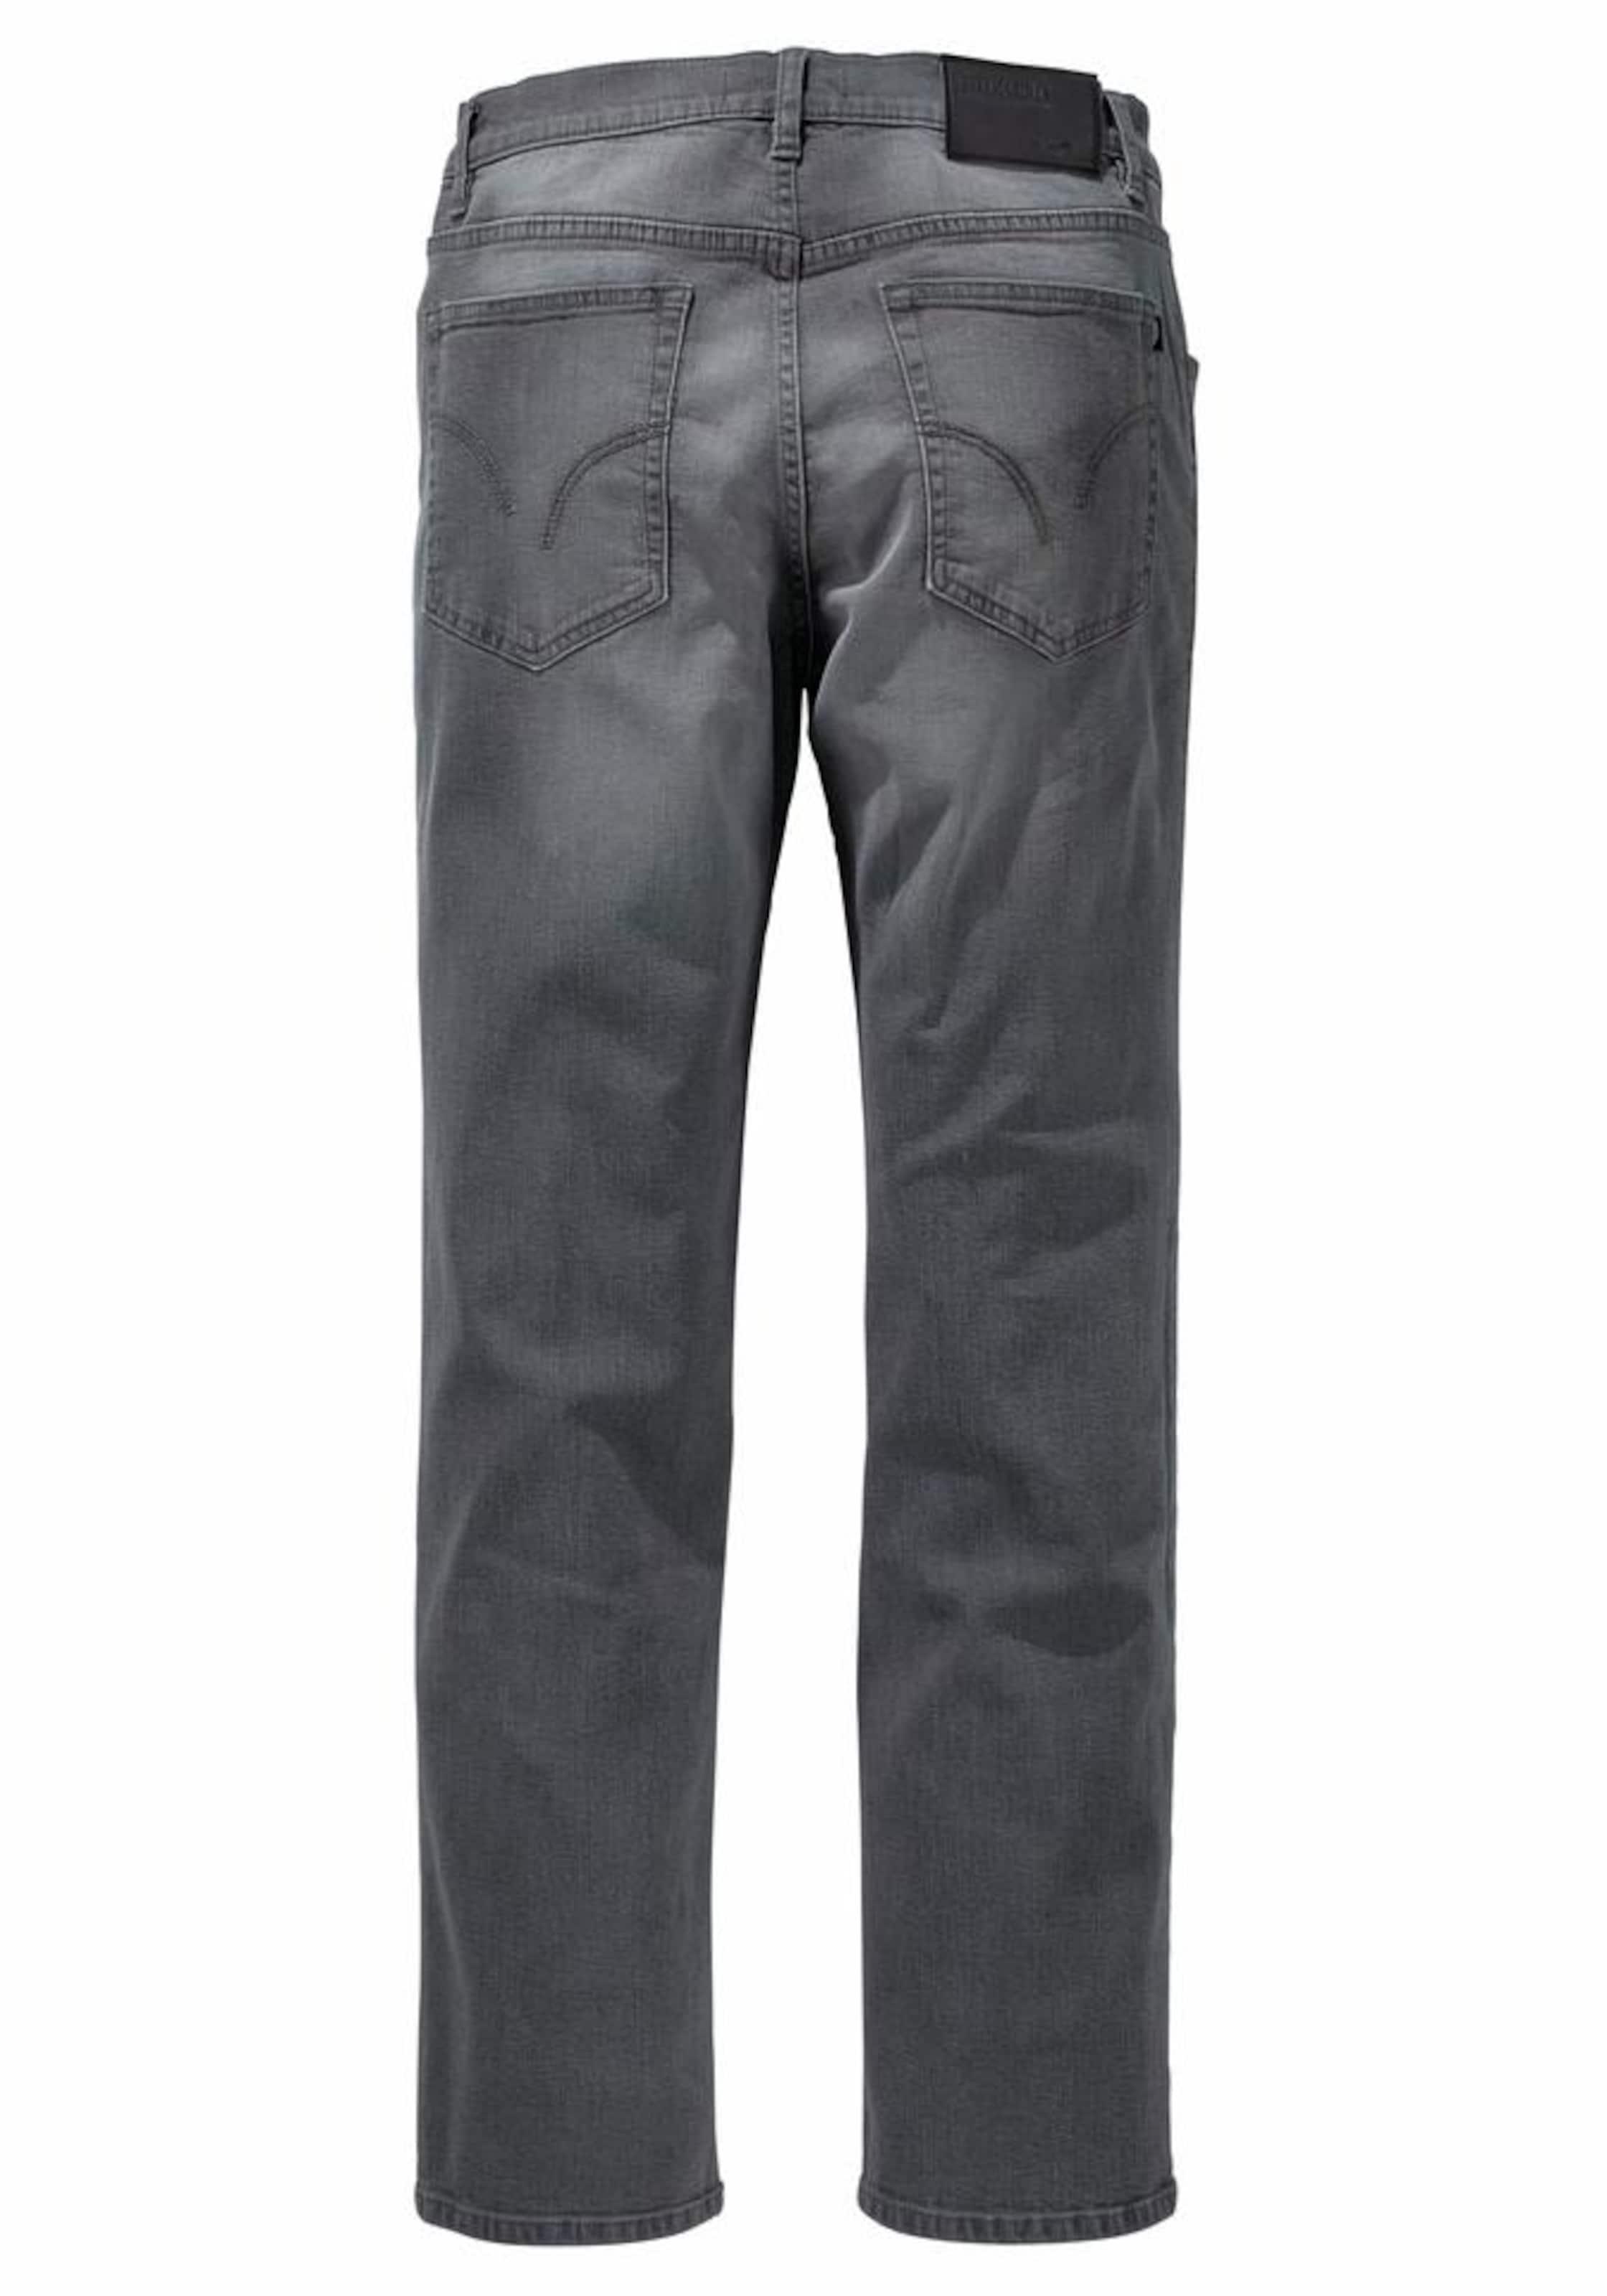 jeans 'willis'packung2 BlauGraphit TlgIn Arizona Stretch iuZwTPOXkl